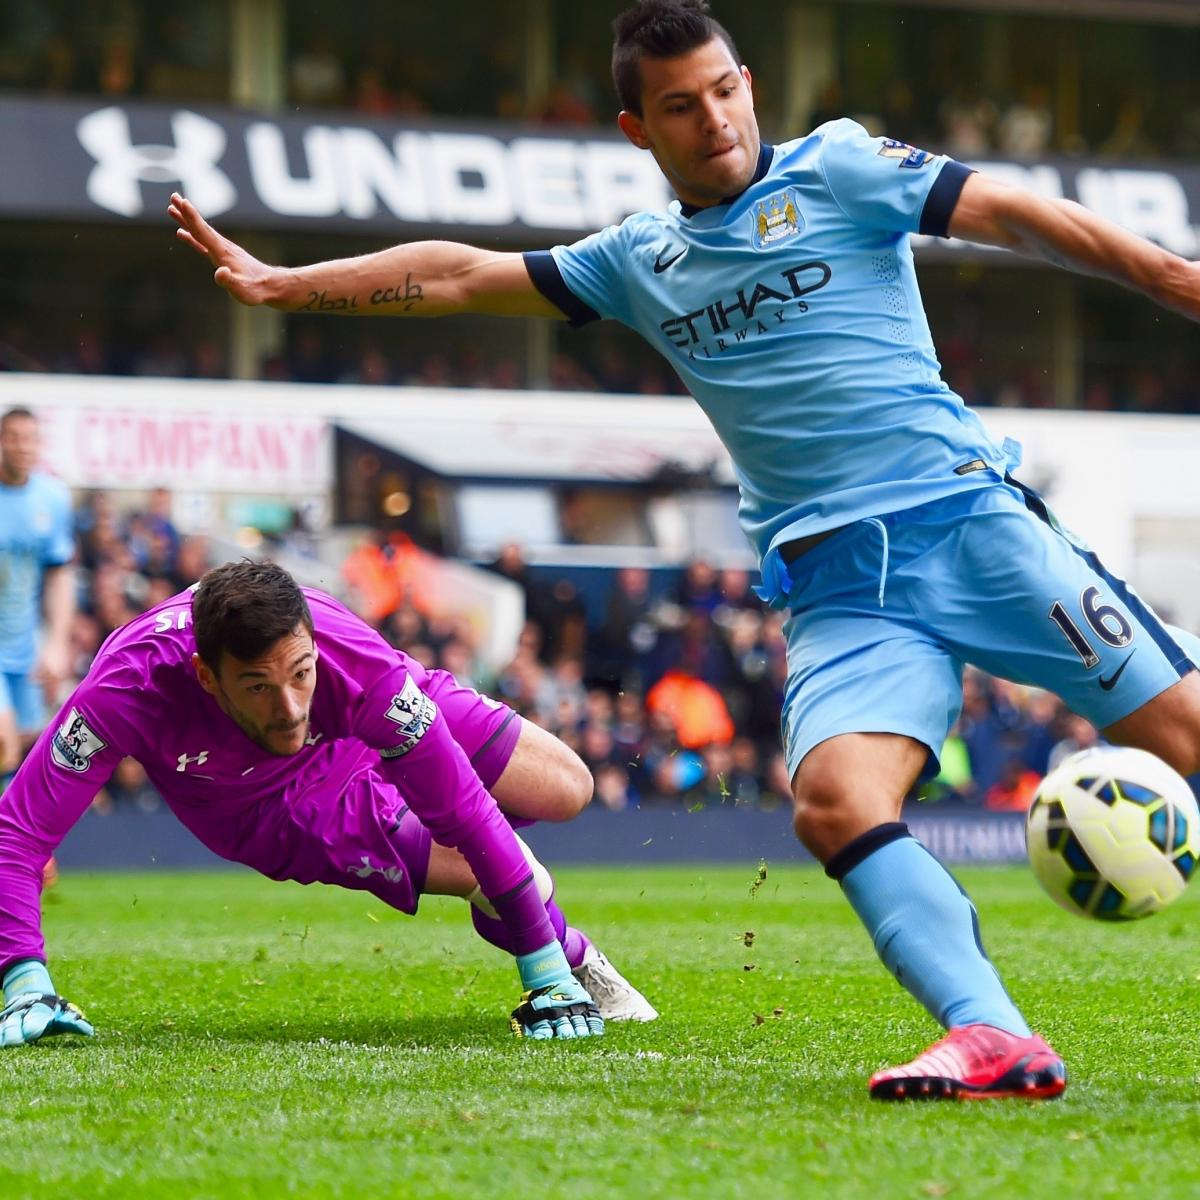 Tottenham 3 Fulham 1 Match Highlights Harry Kane Scores: Tottenham Vs. Manchester City: Score, Grades, Reaction